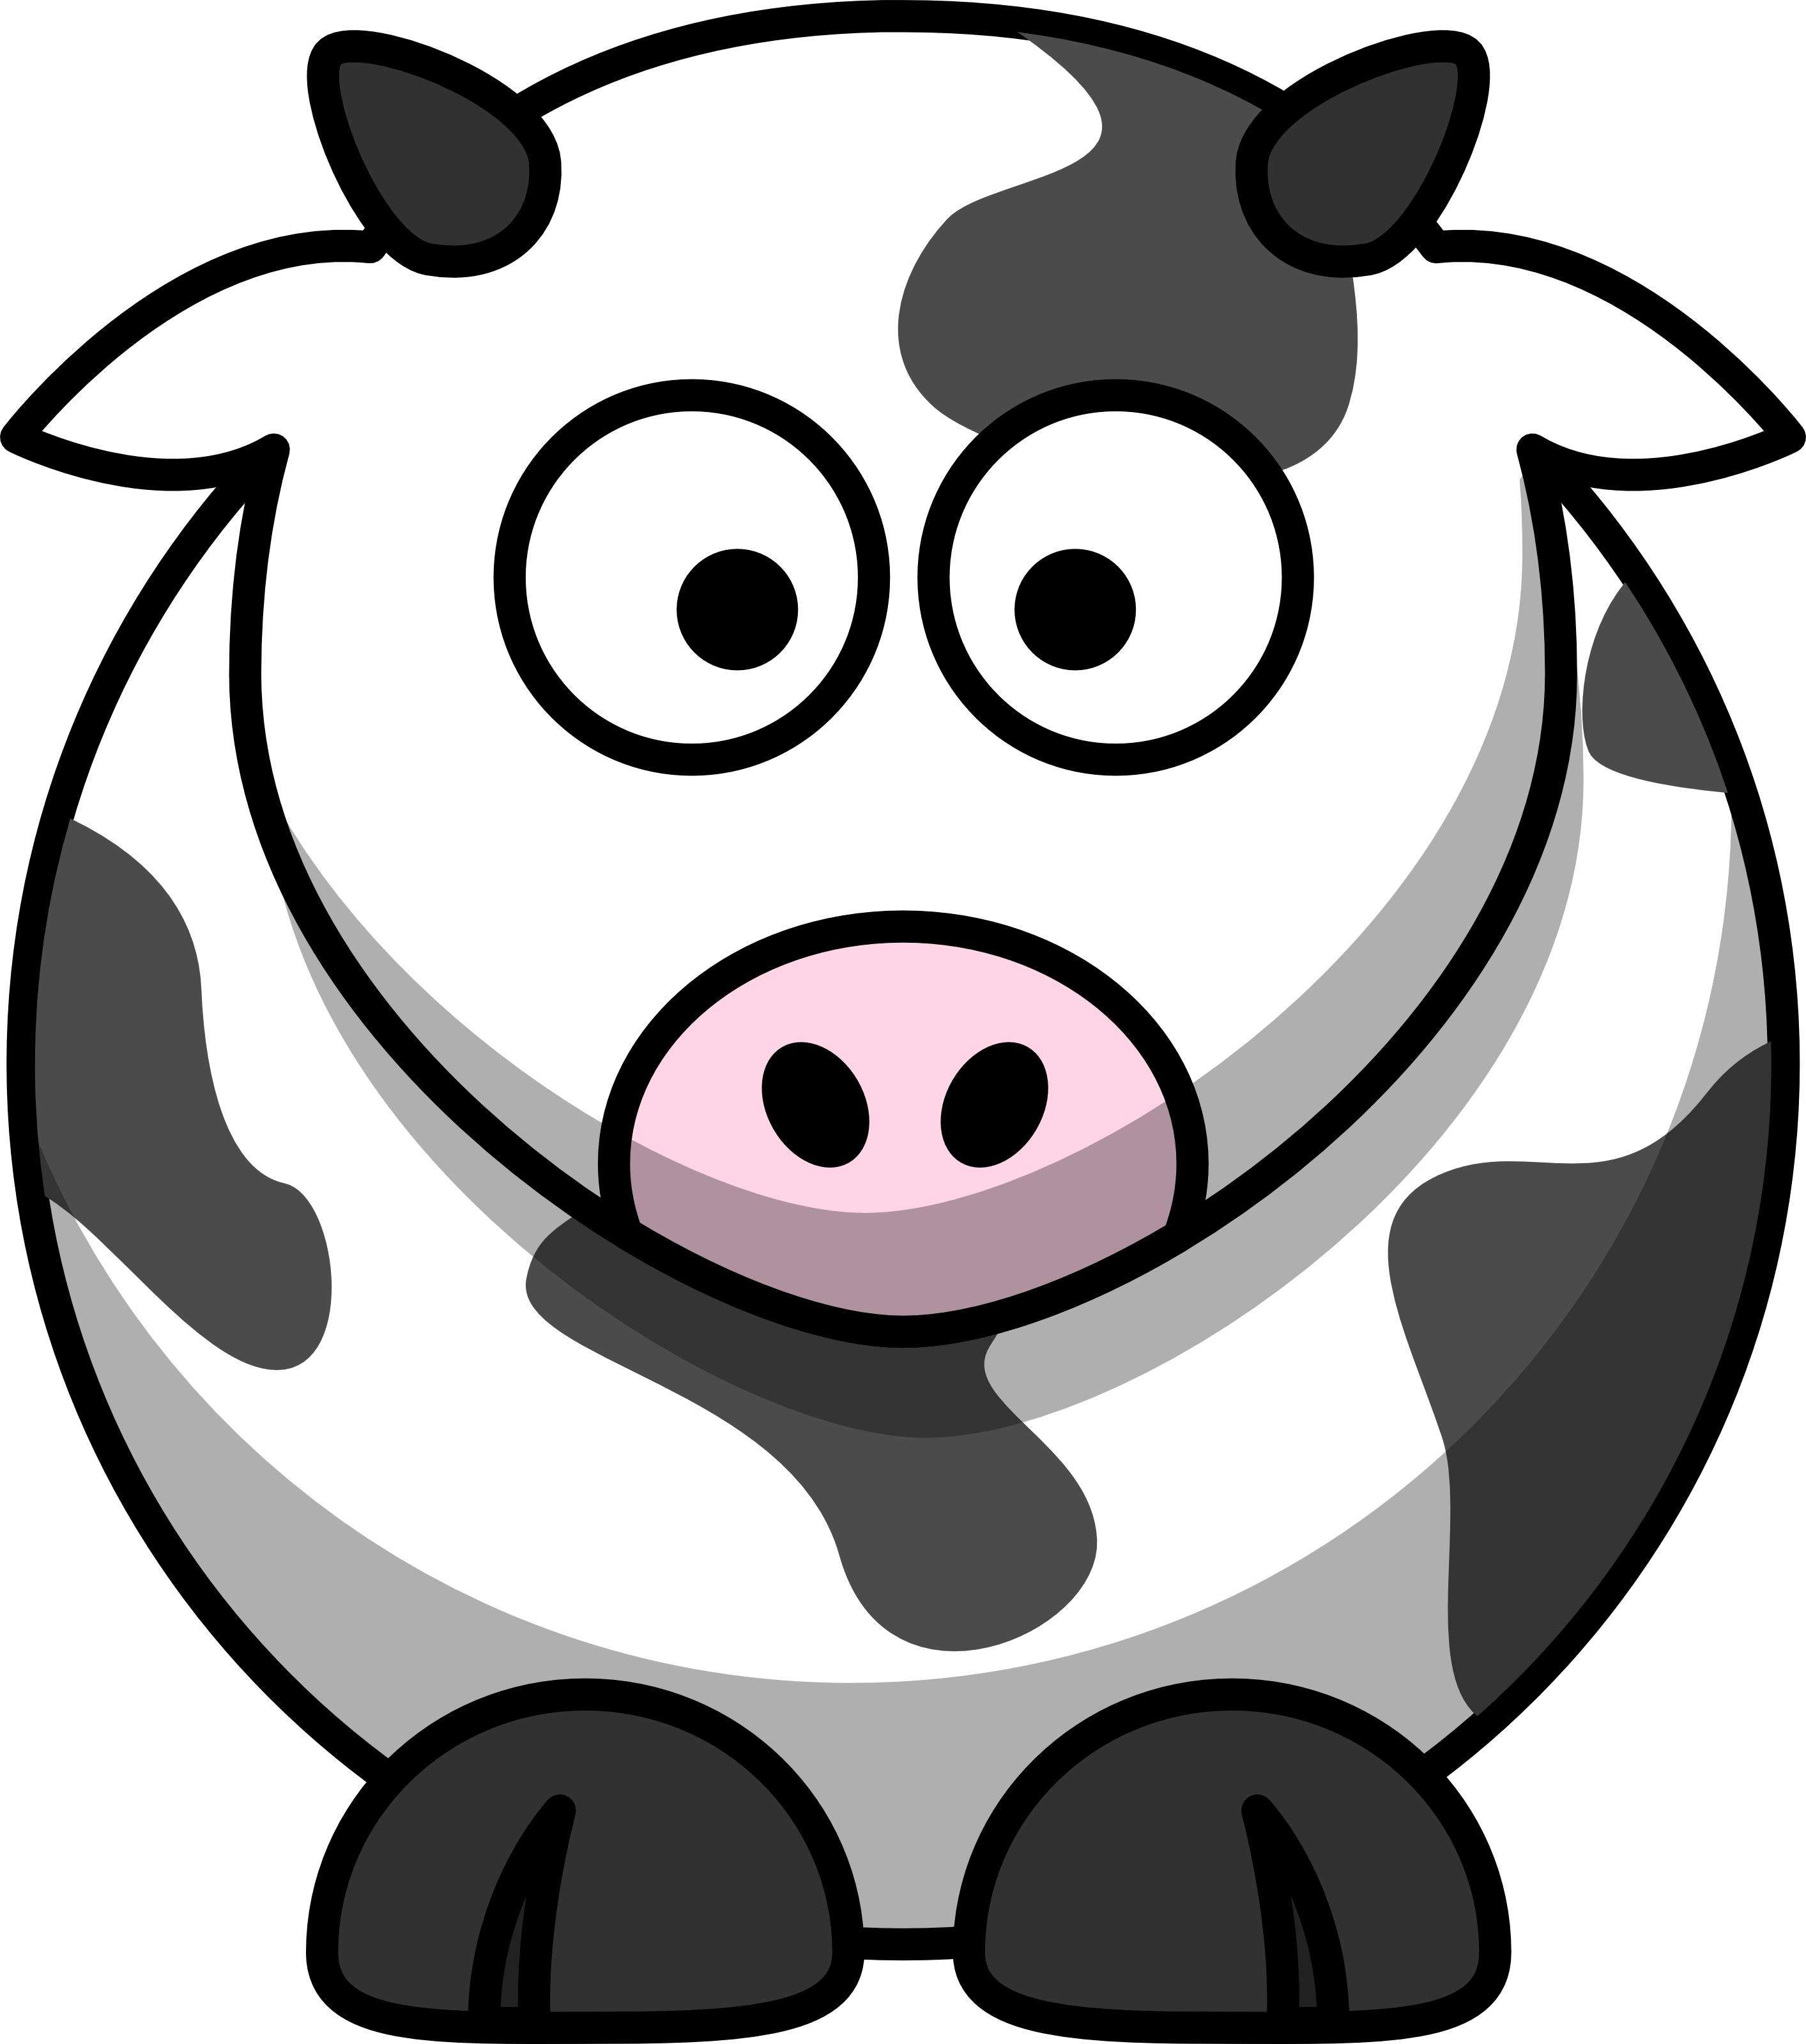 Clipart - Pig, Cow-Clipart - Pig, Cow-12